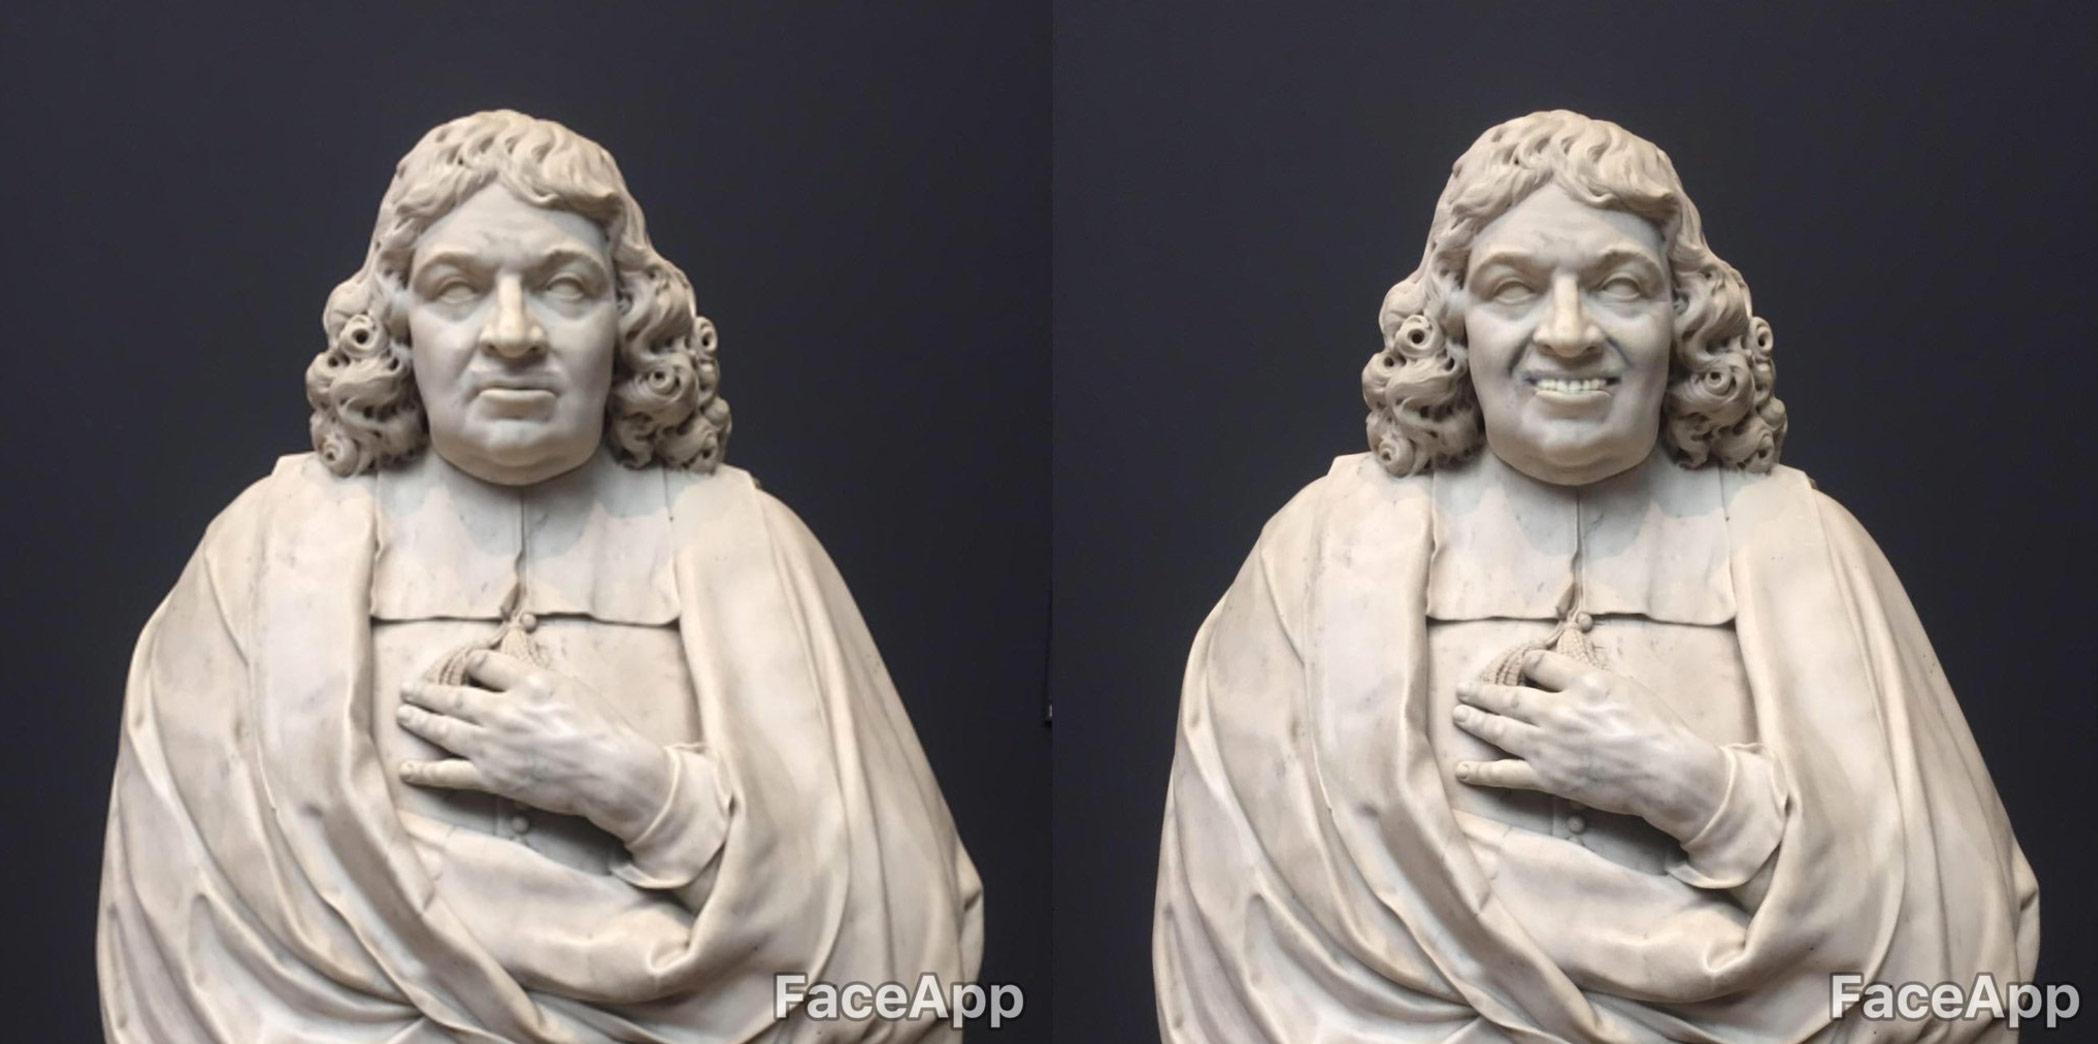 museum-face-app-5